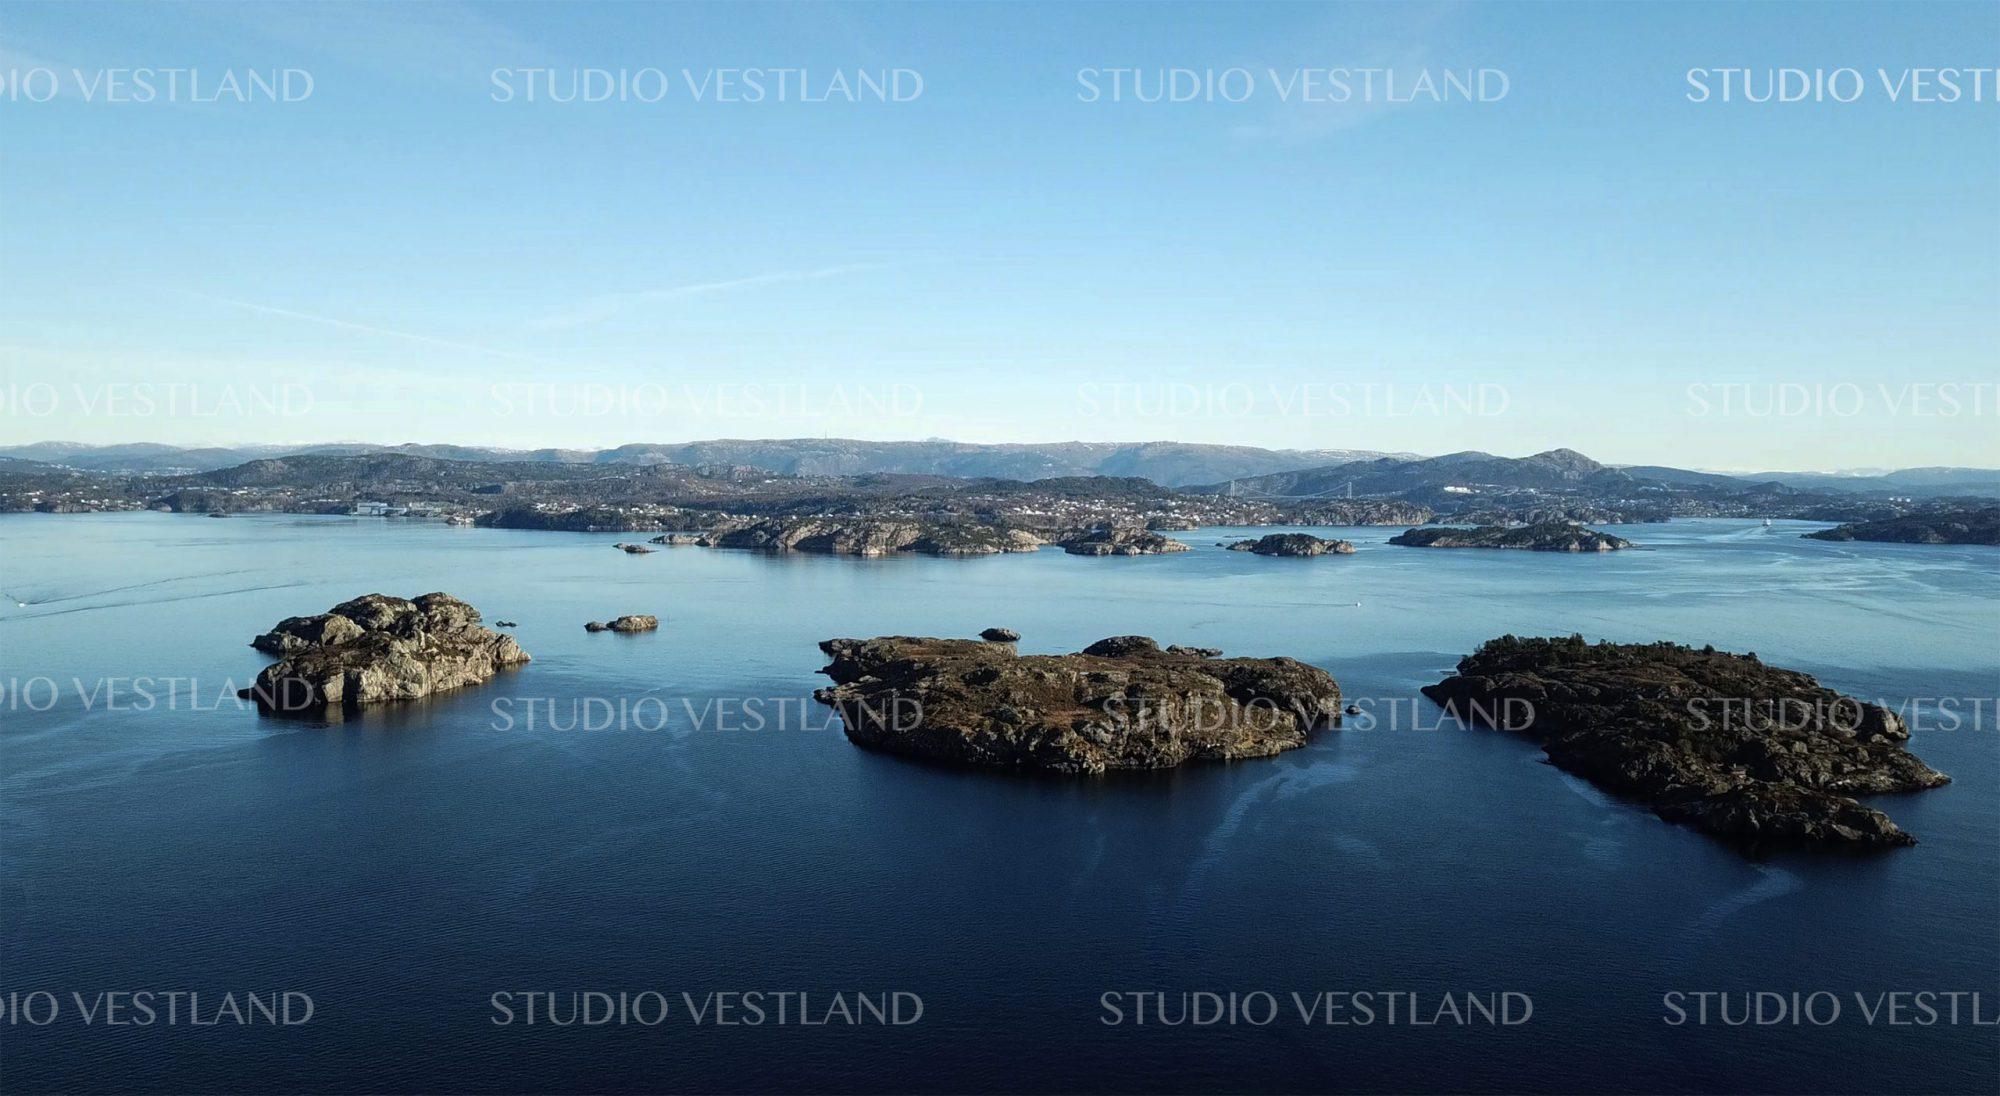 Studio Vestland - Ågotnes mot sørvest